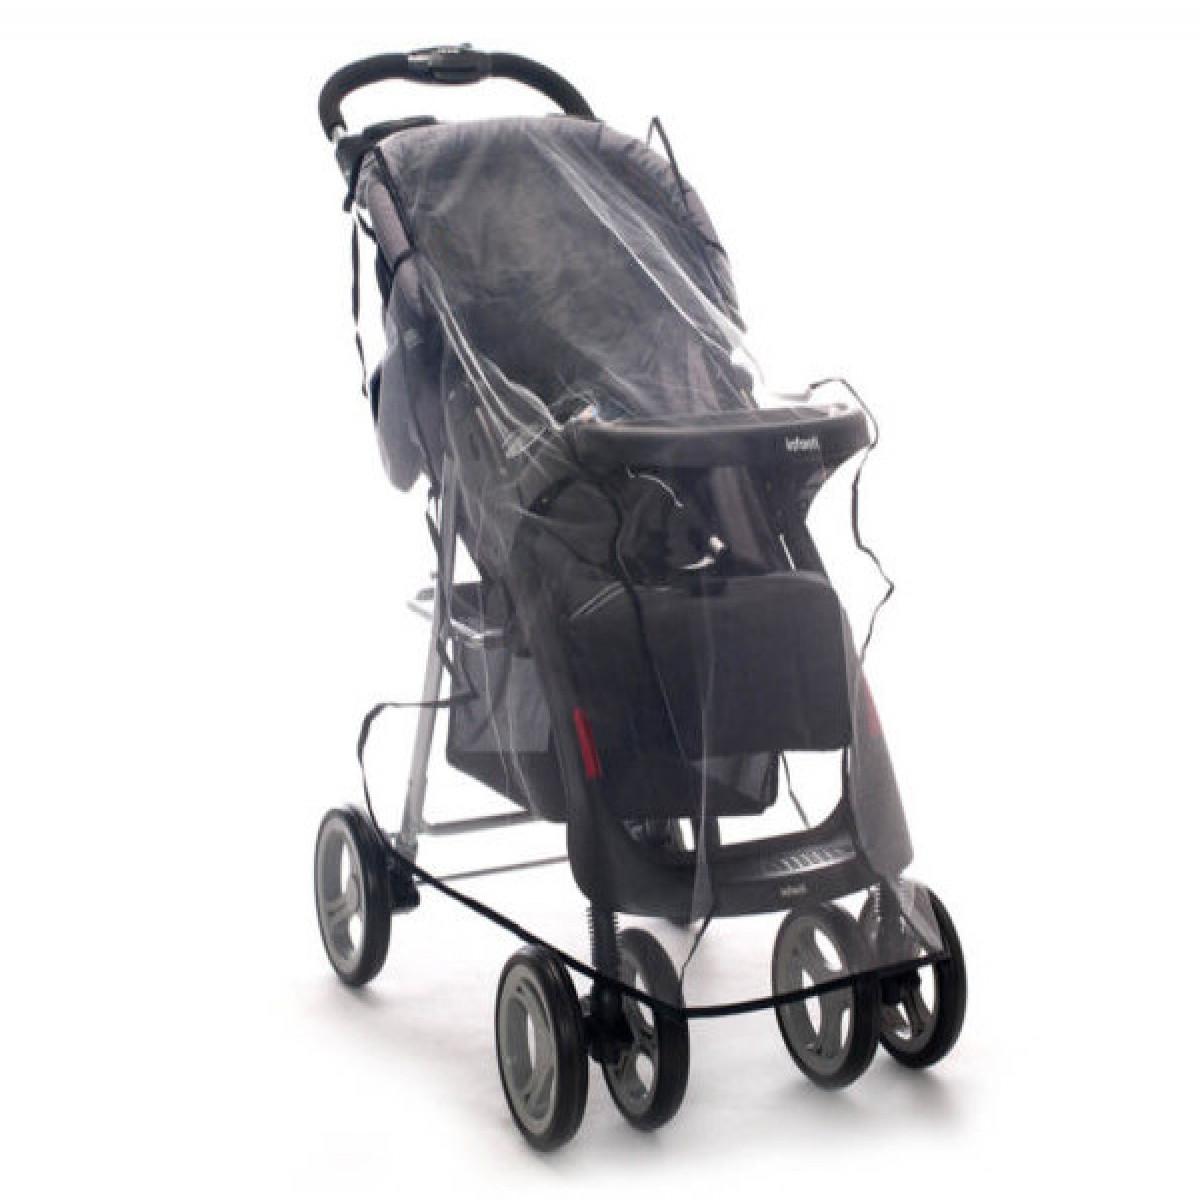 Tul universal para coche  Infanti negro